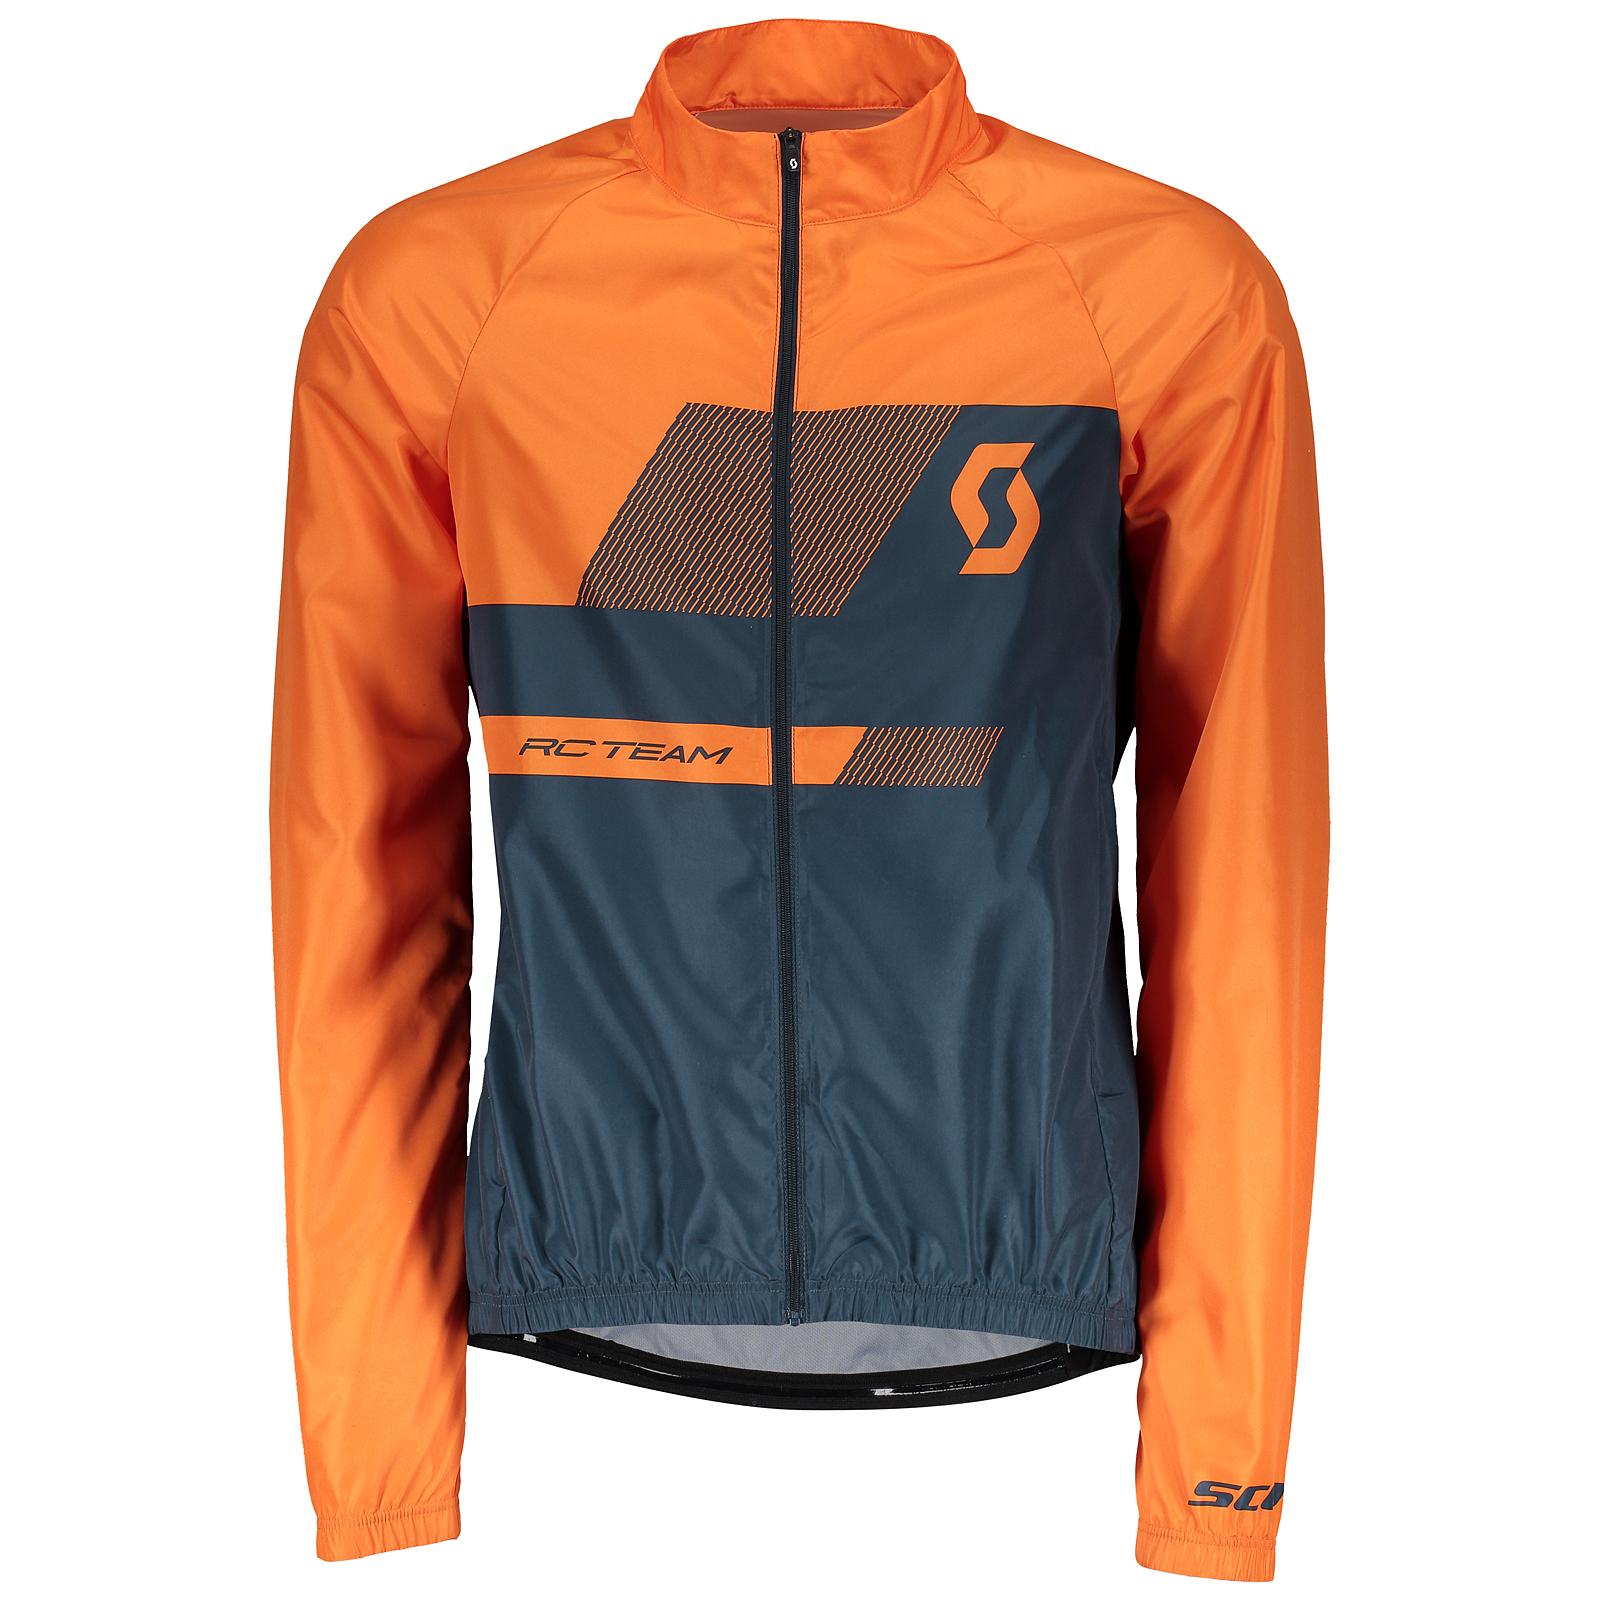 buy popular 4fb0f 0dcc8 Scott RC Team 10 Fahrrad Windjacke orange/blau 2018